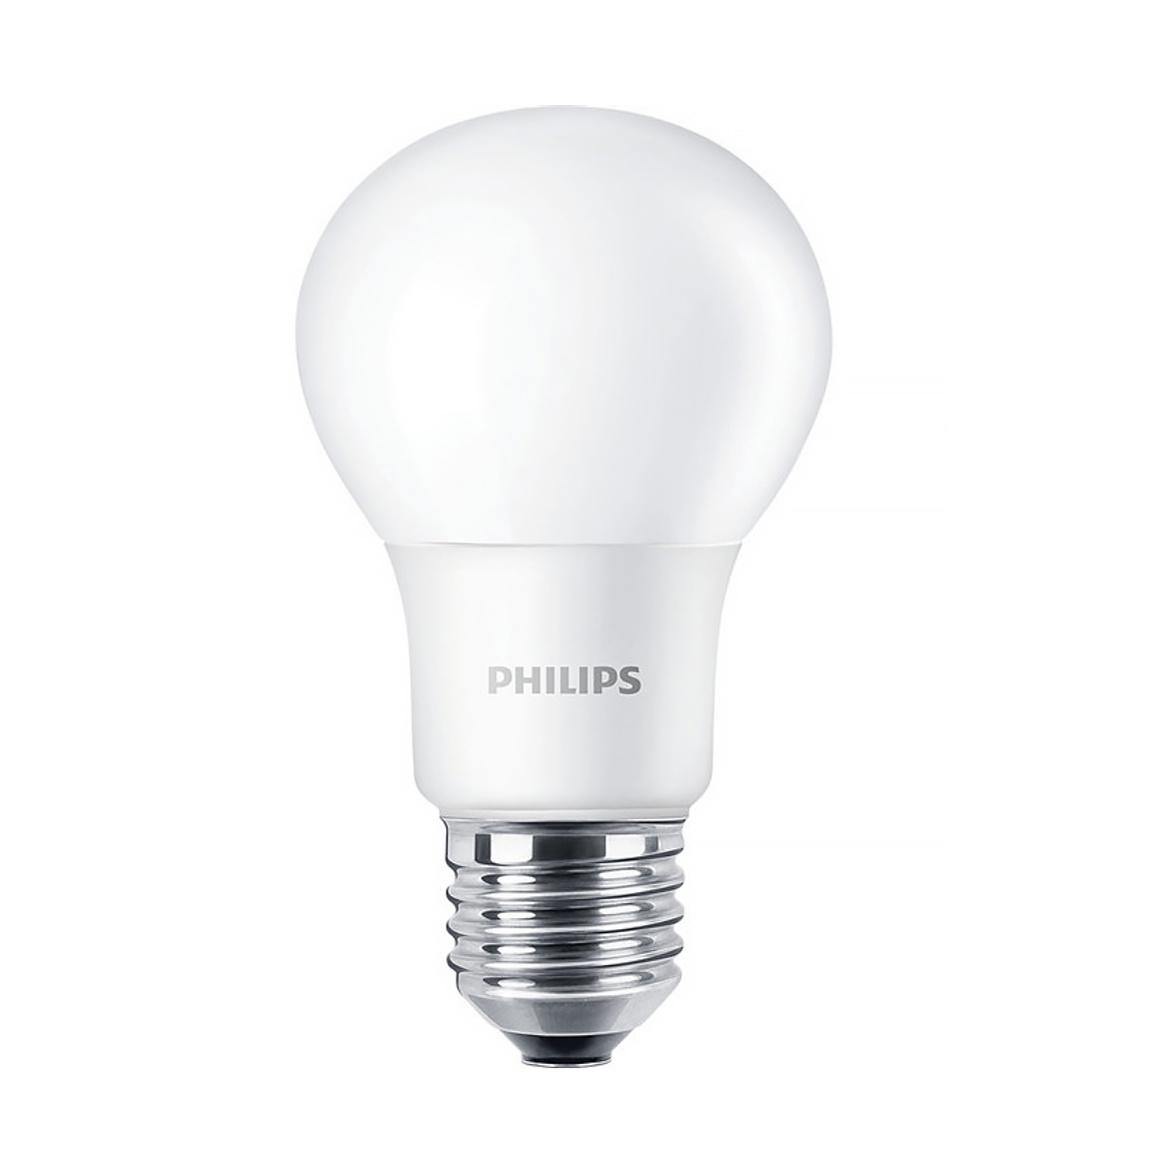 Philips LED E27 lamp 100-13 Watt Philips warmglow DIM